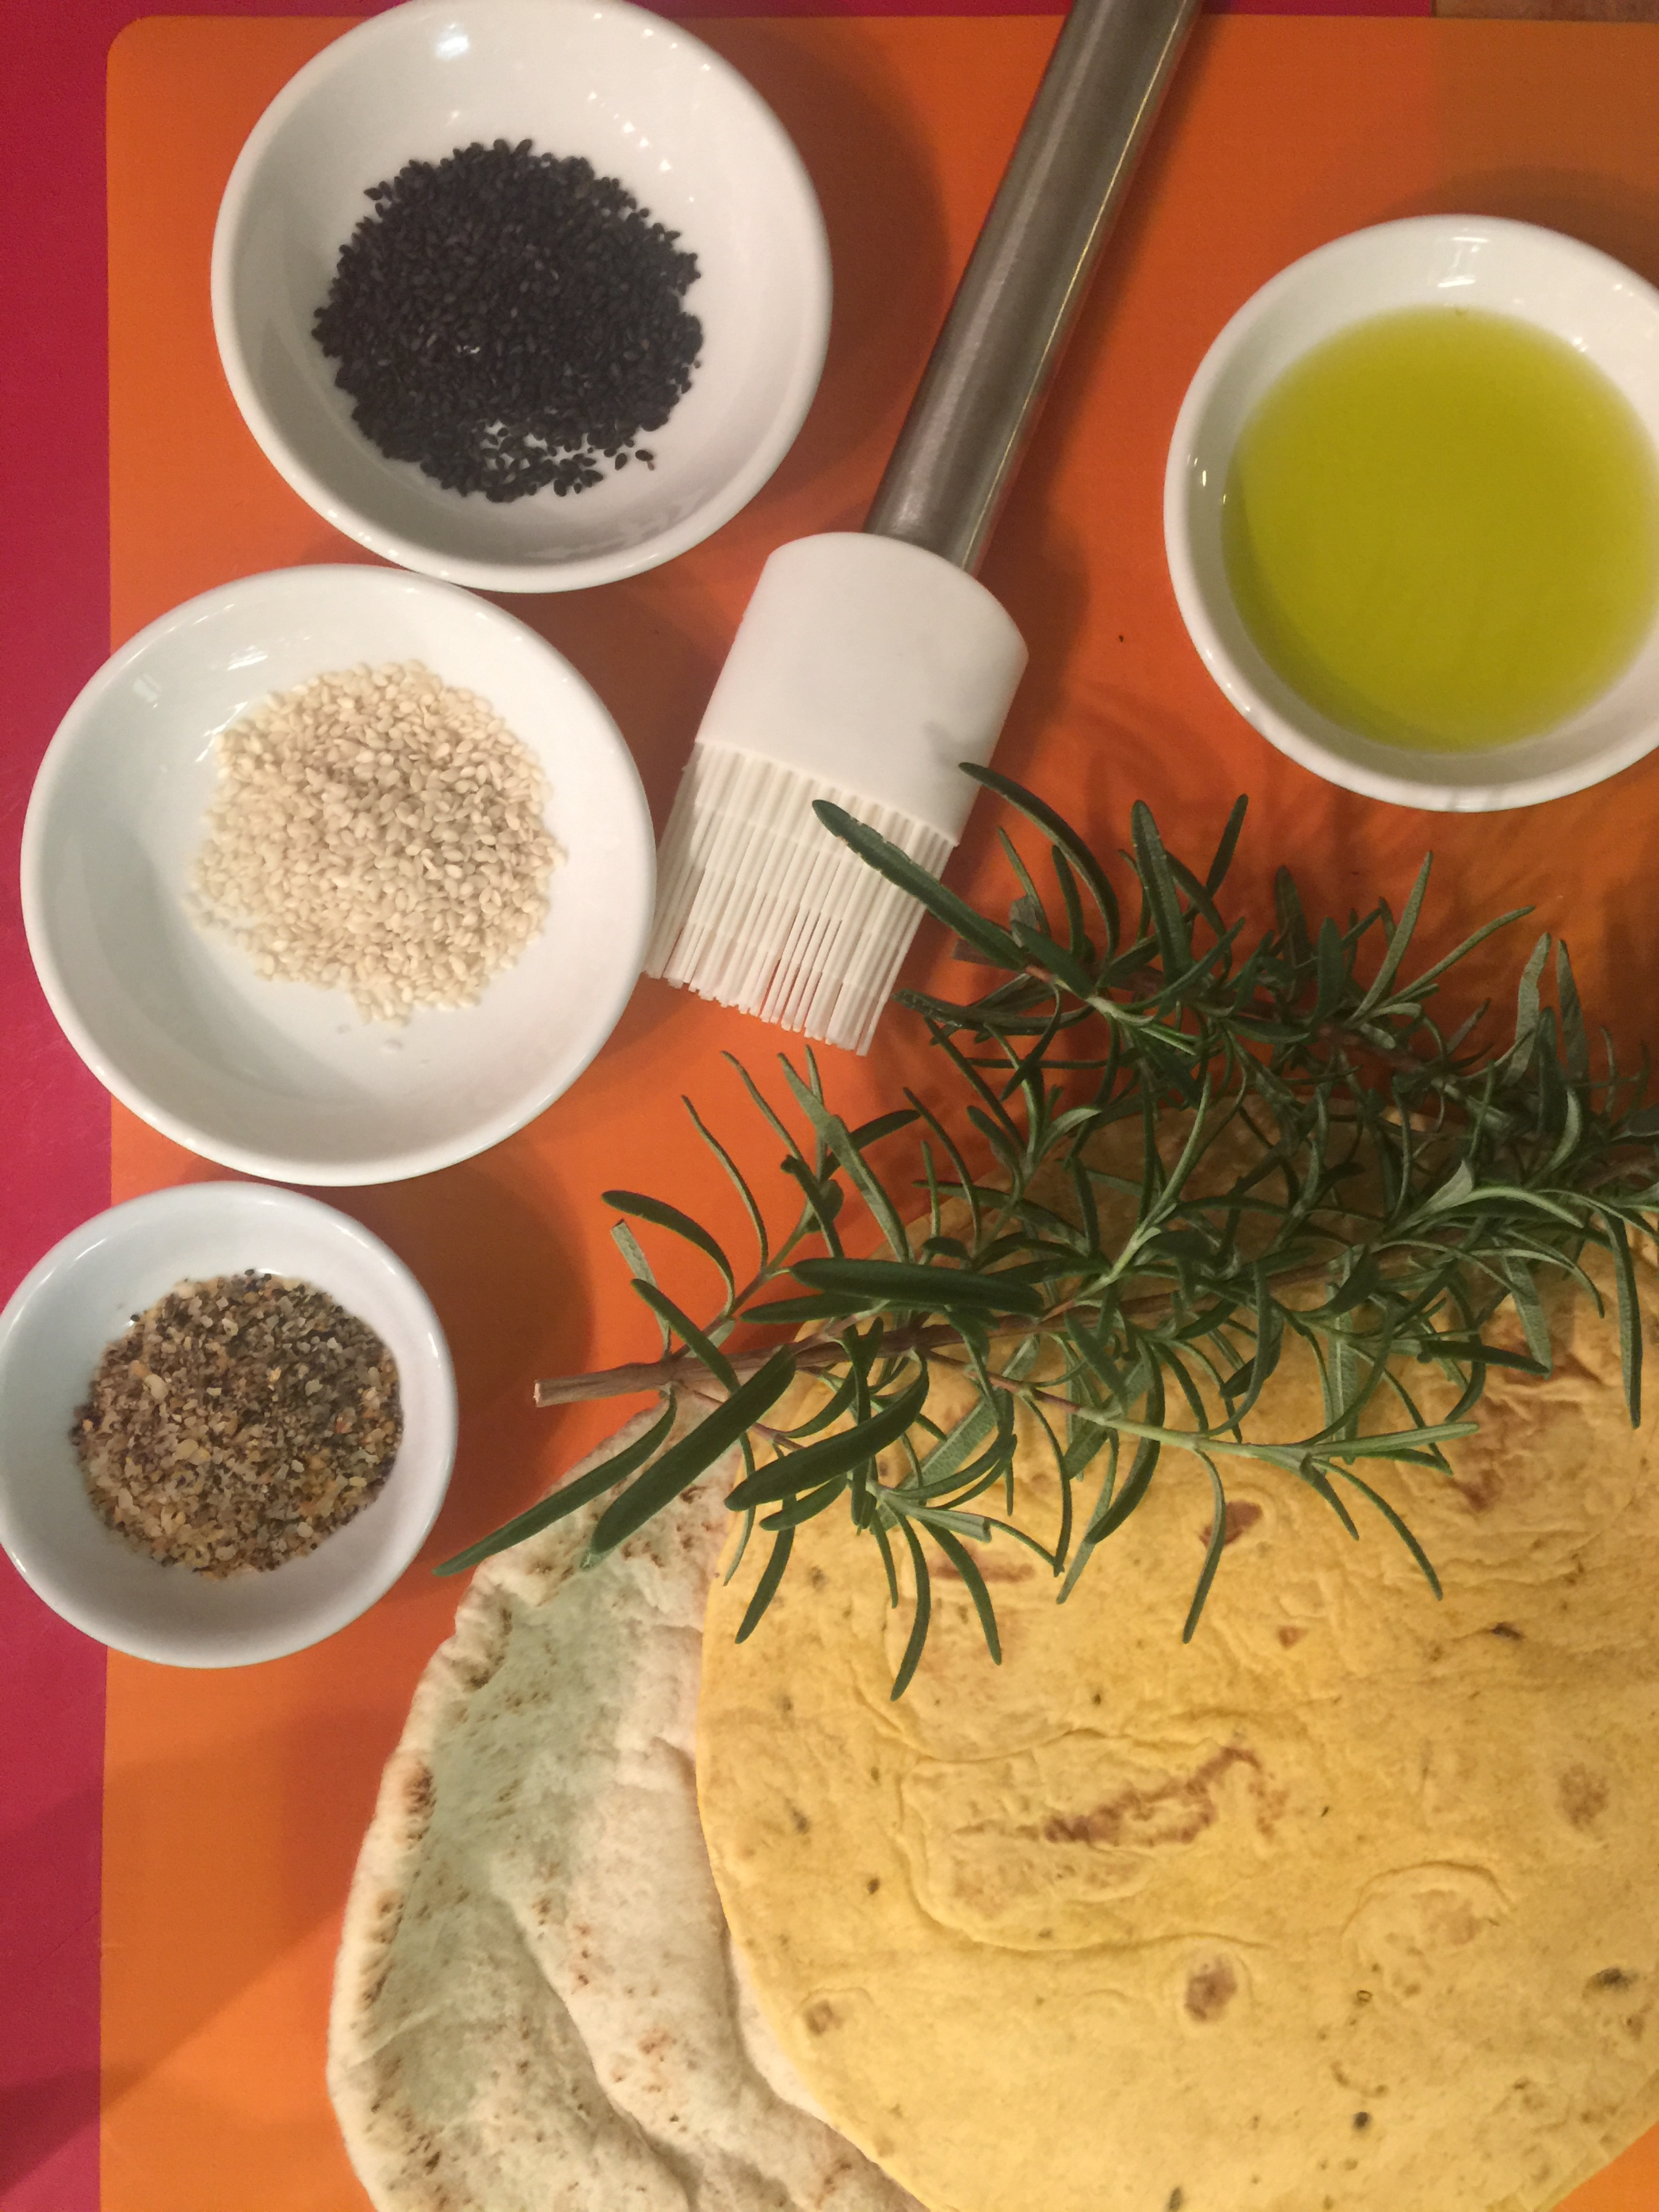 Tortillas, pita bread, black and white sesame seeds, steak seasoning, olive oil